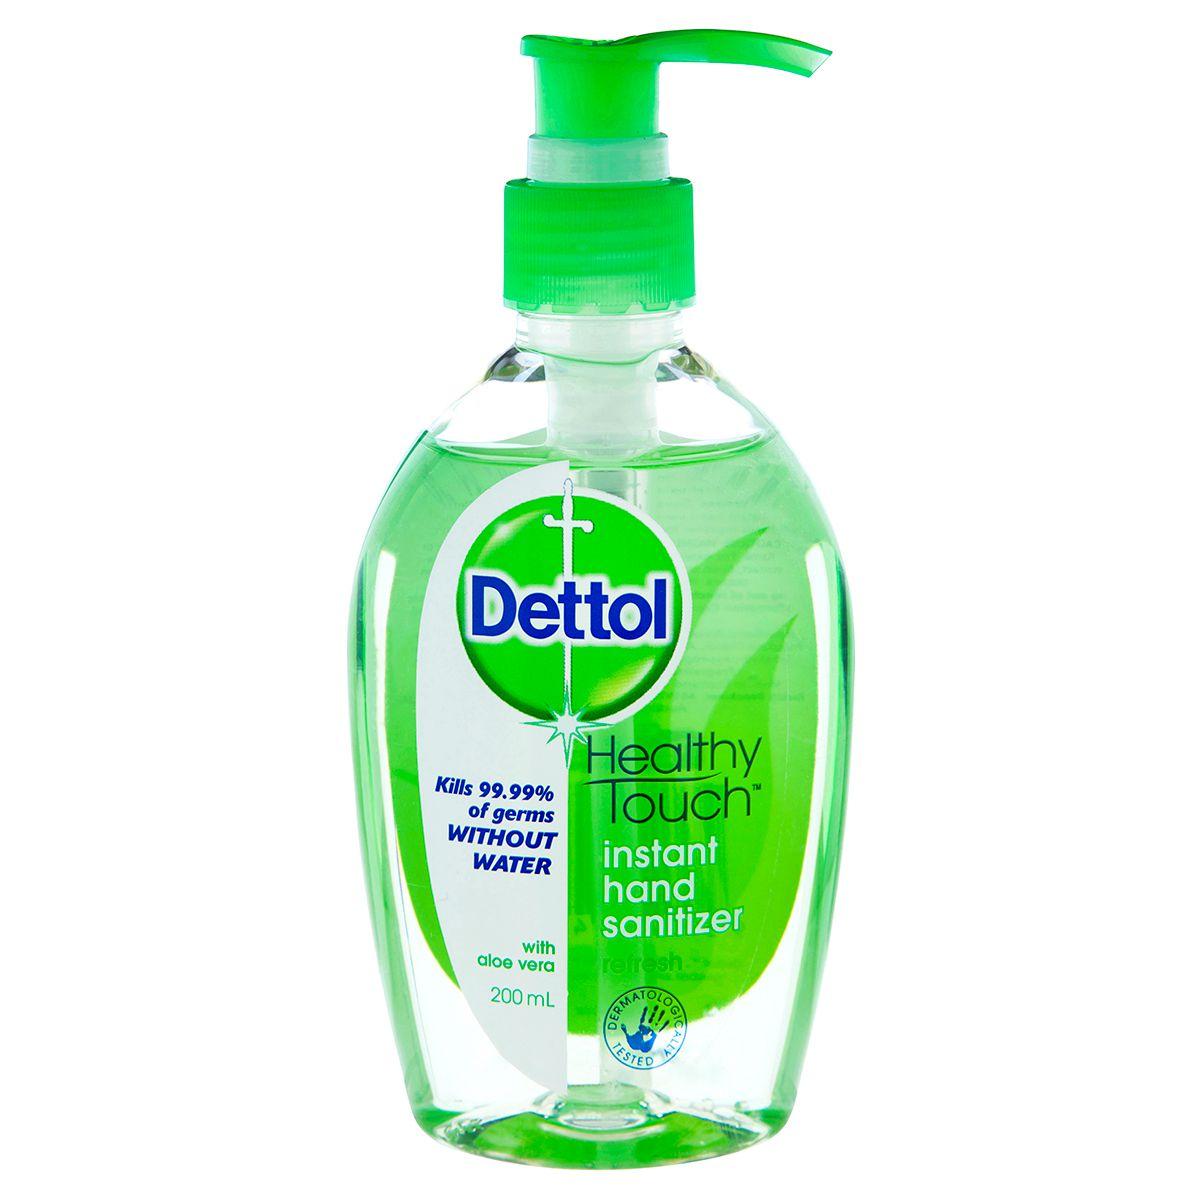 Dettol Instant Hand Sanitizer Refresh 200ml